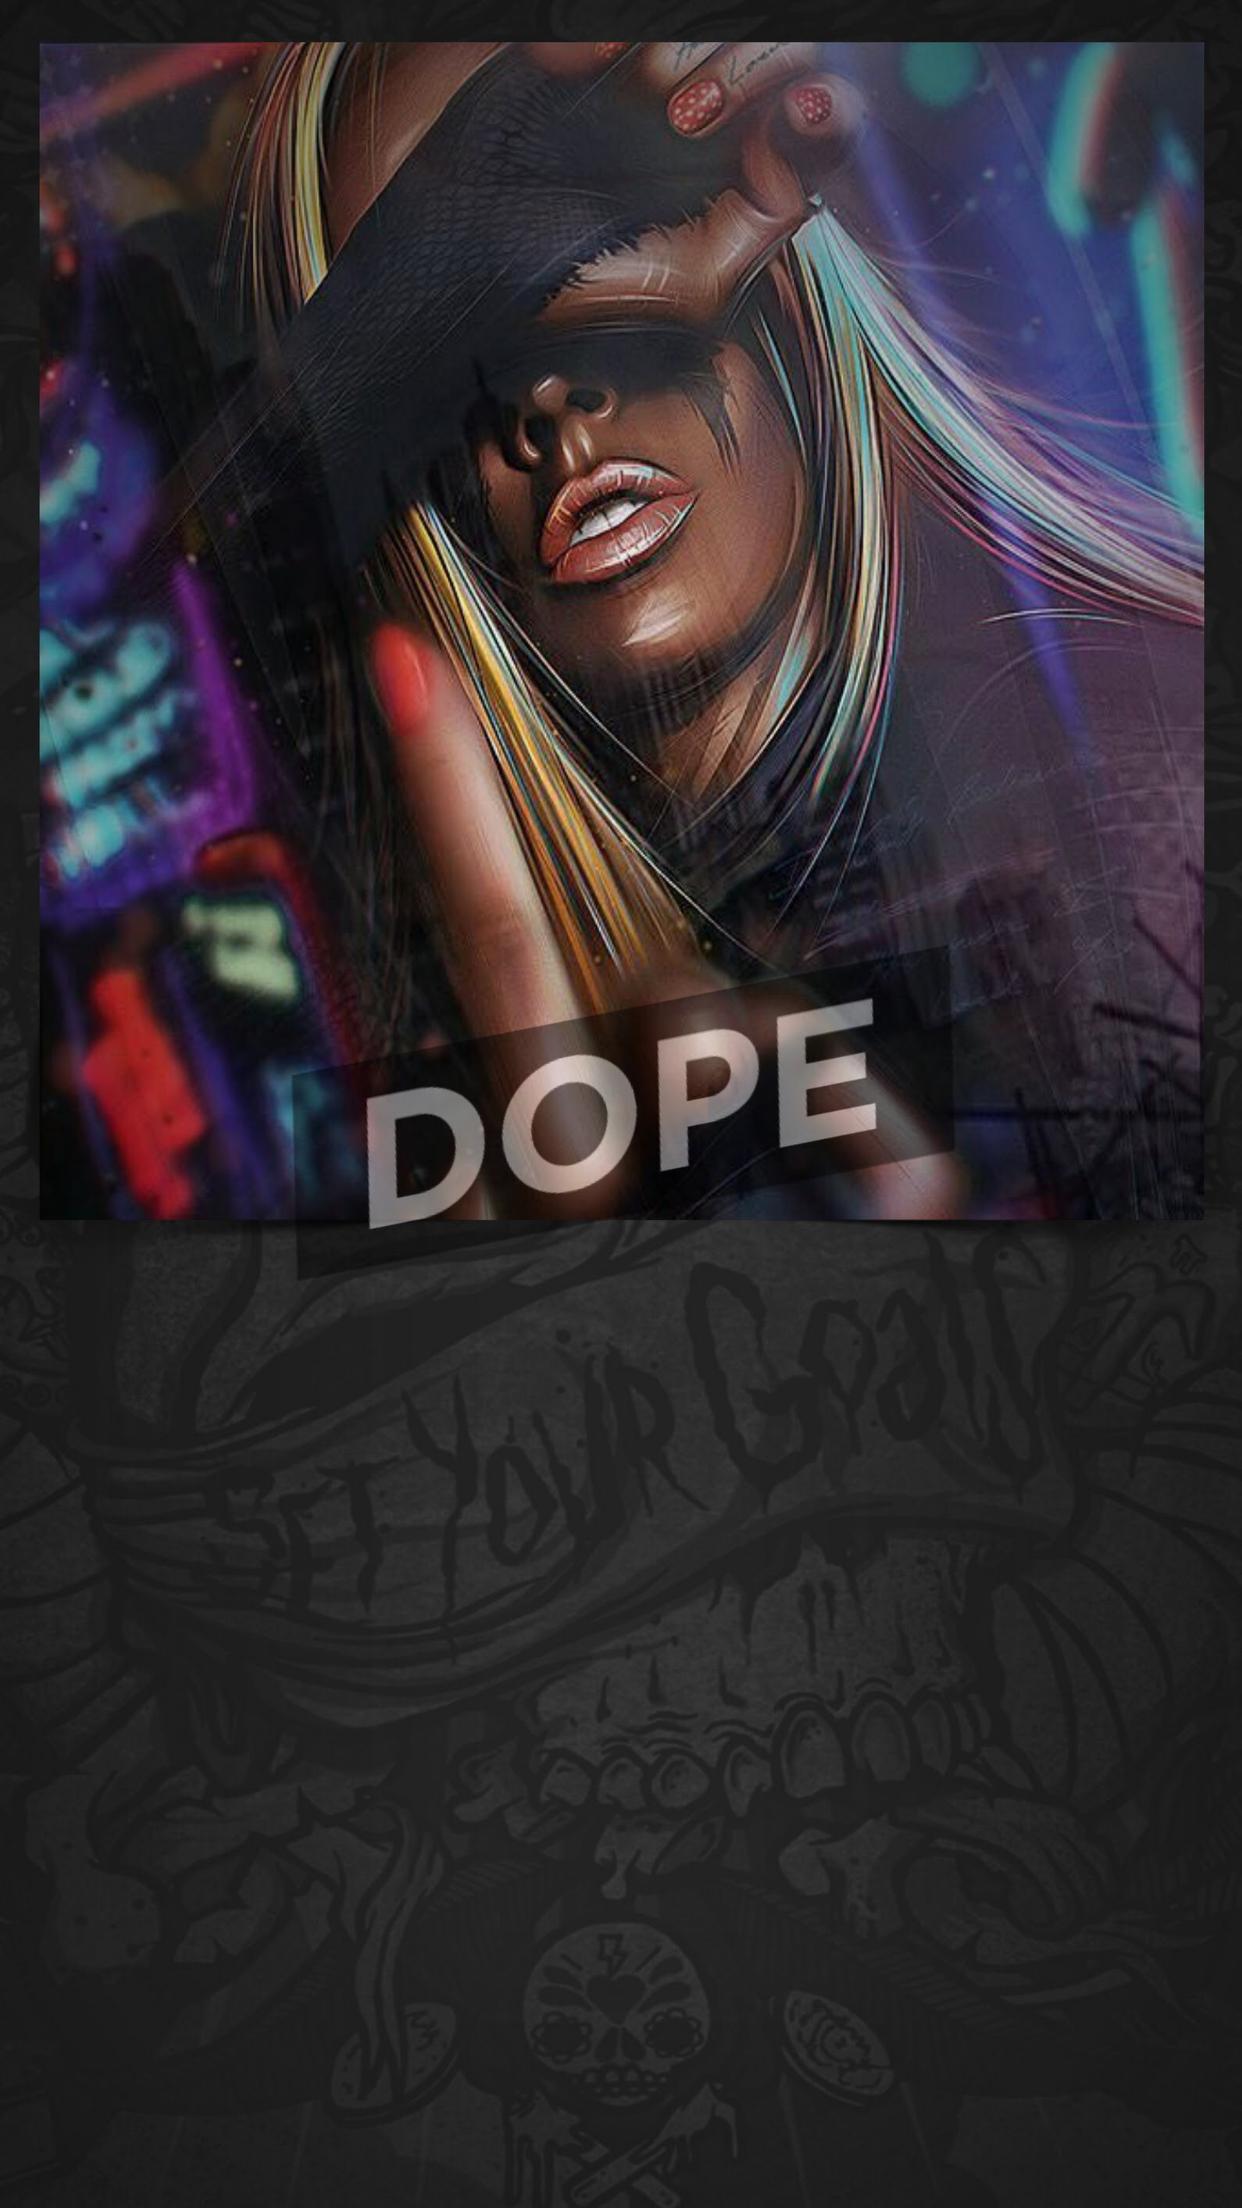 Gangsta Girl Iphone Wallpaper ℛᎬℬᎬᏞ ᎶᎥᏒᏞ Pinterest Crackpot Baby ℛᎬℬᎬᏞ ᎶᎥᏒᏞ